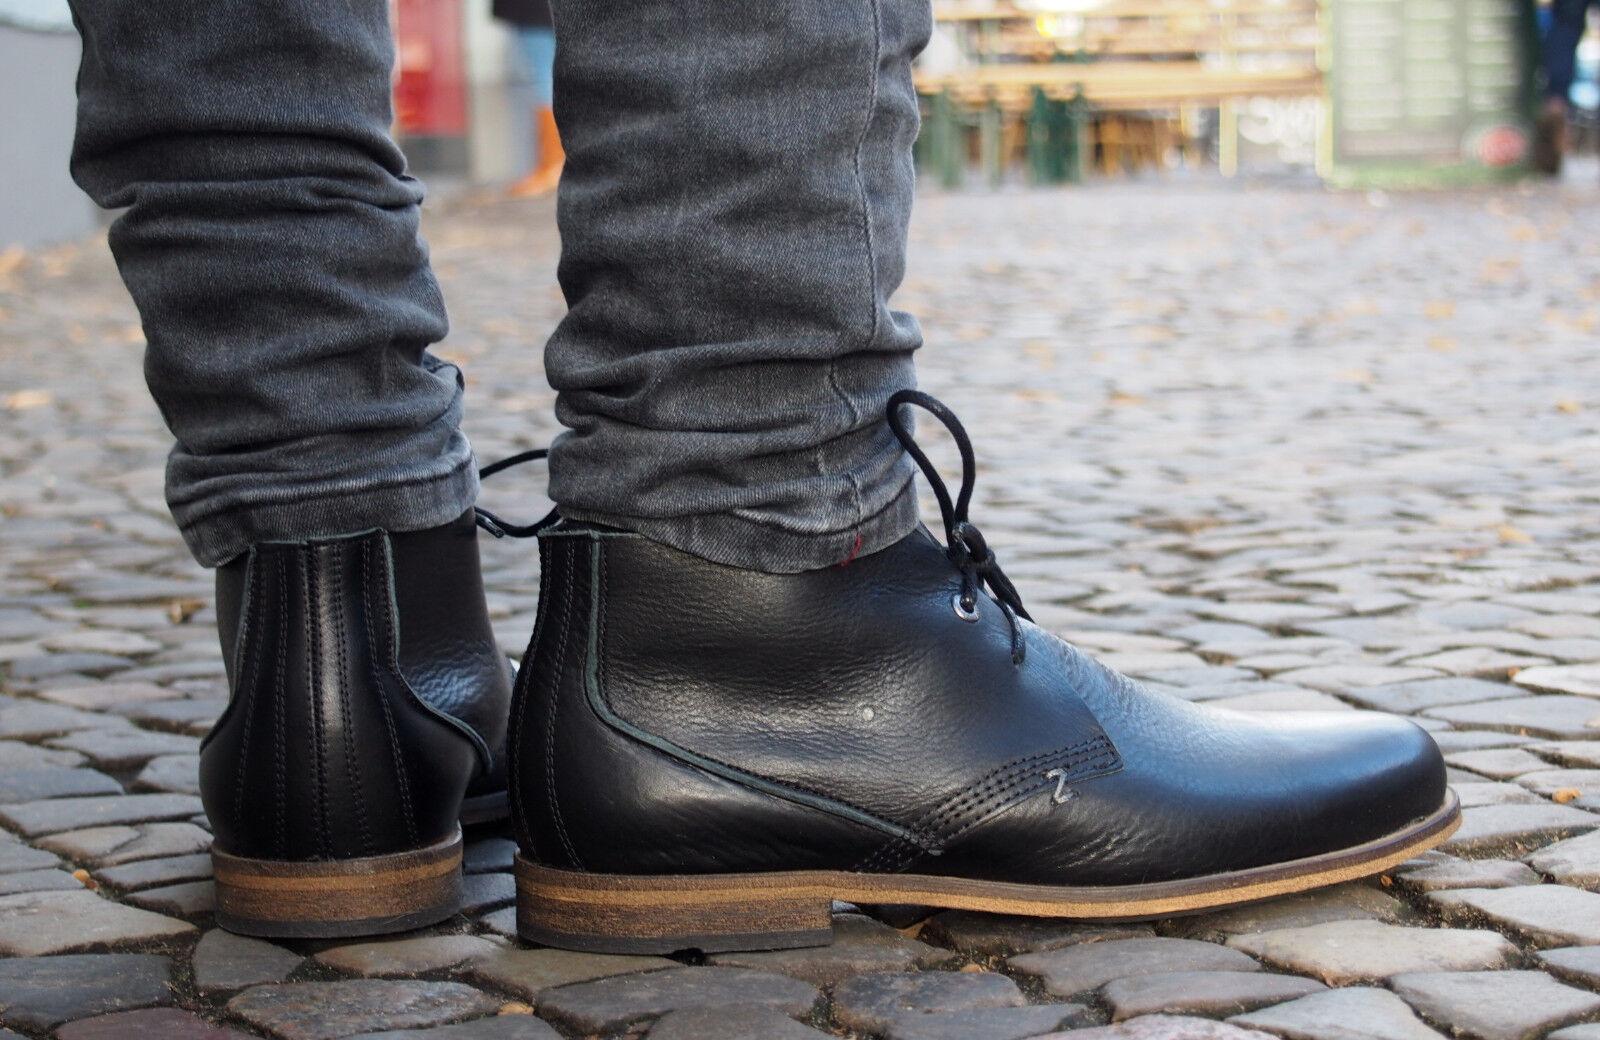 HUB Footwear Herrenschuhe SPURS L black schwarz Echtleder Schnürschuhe NEU SALE